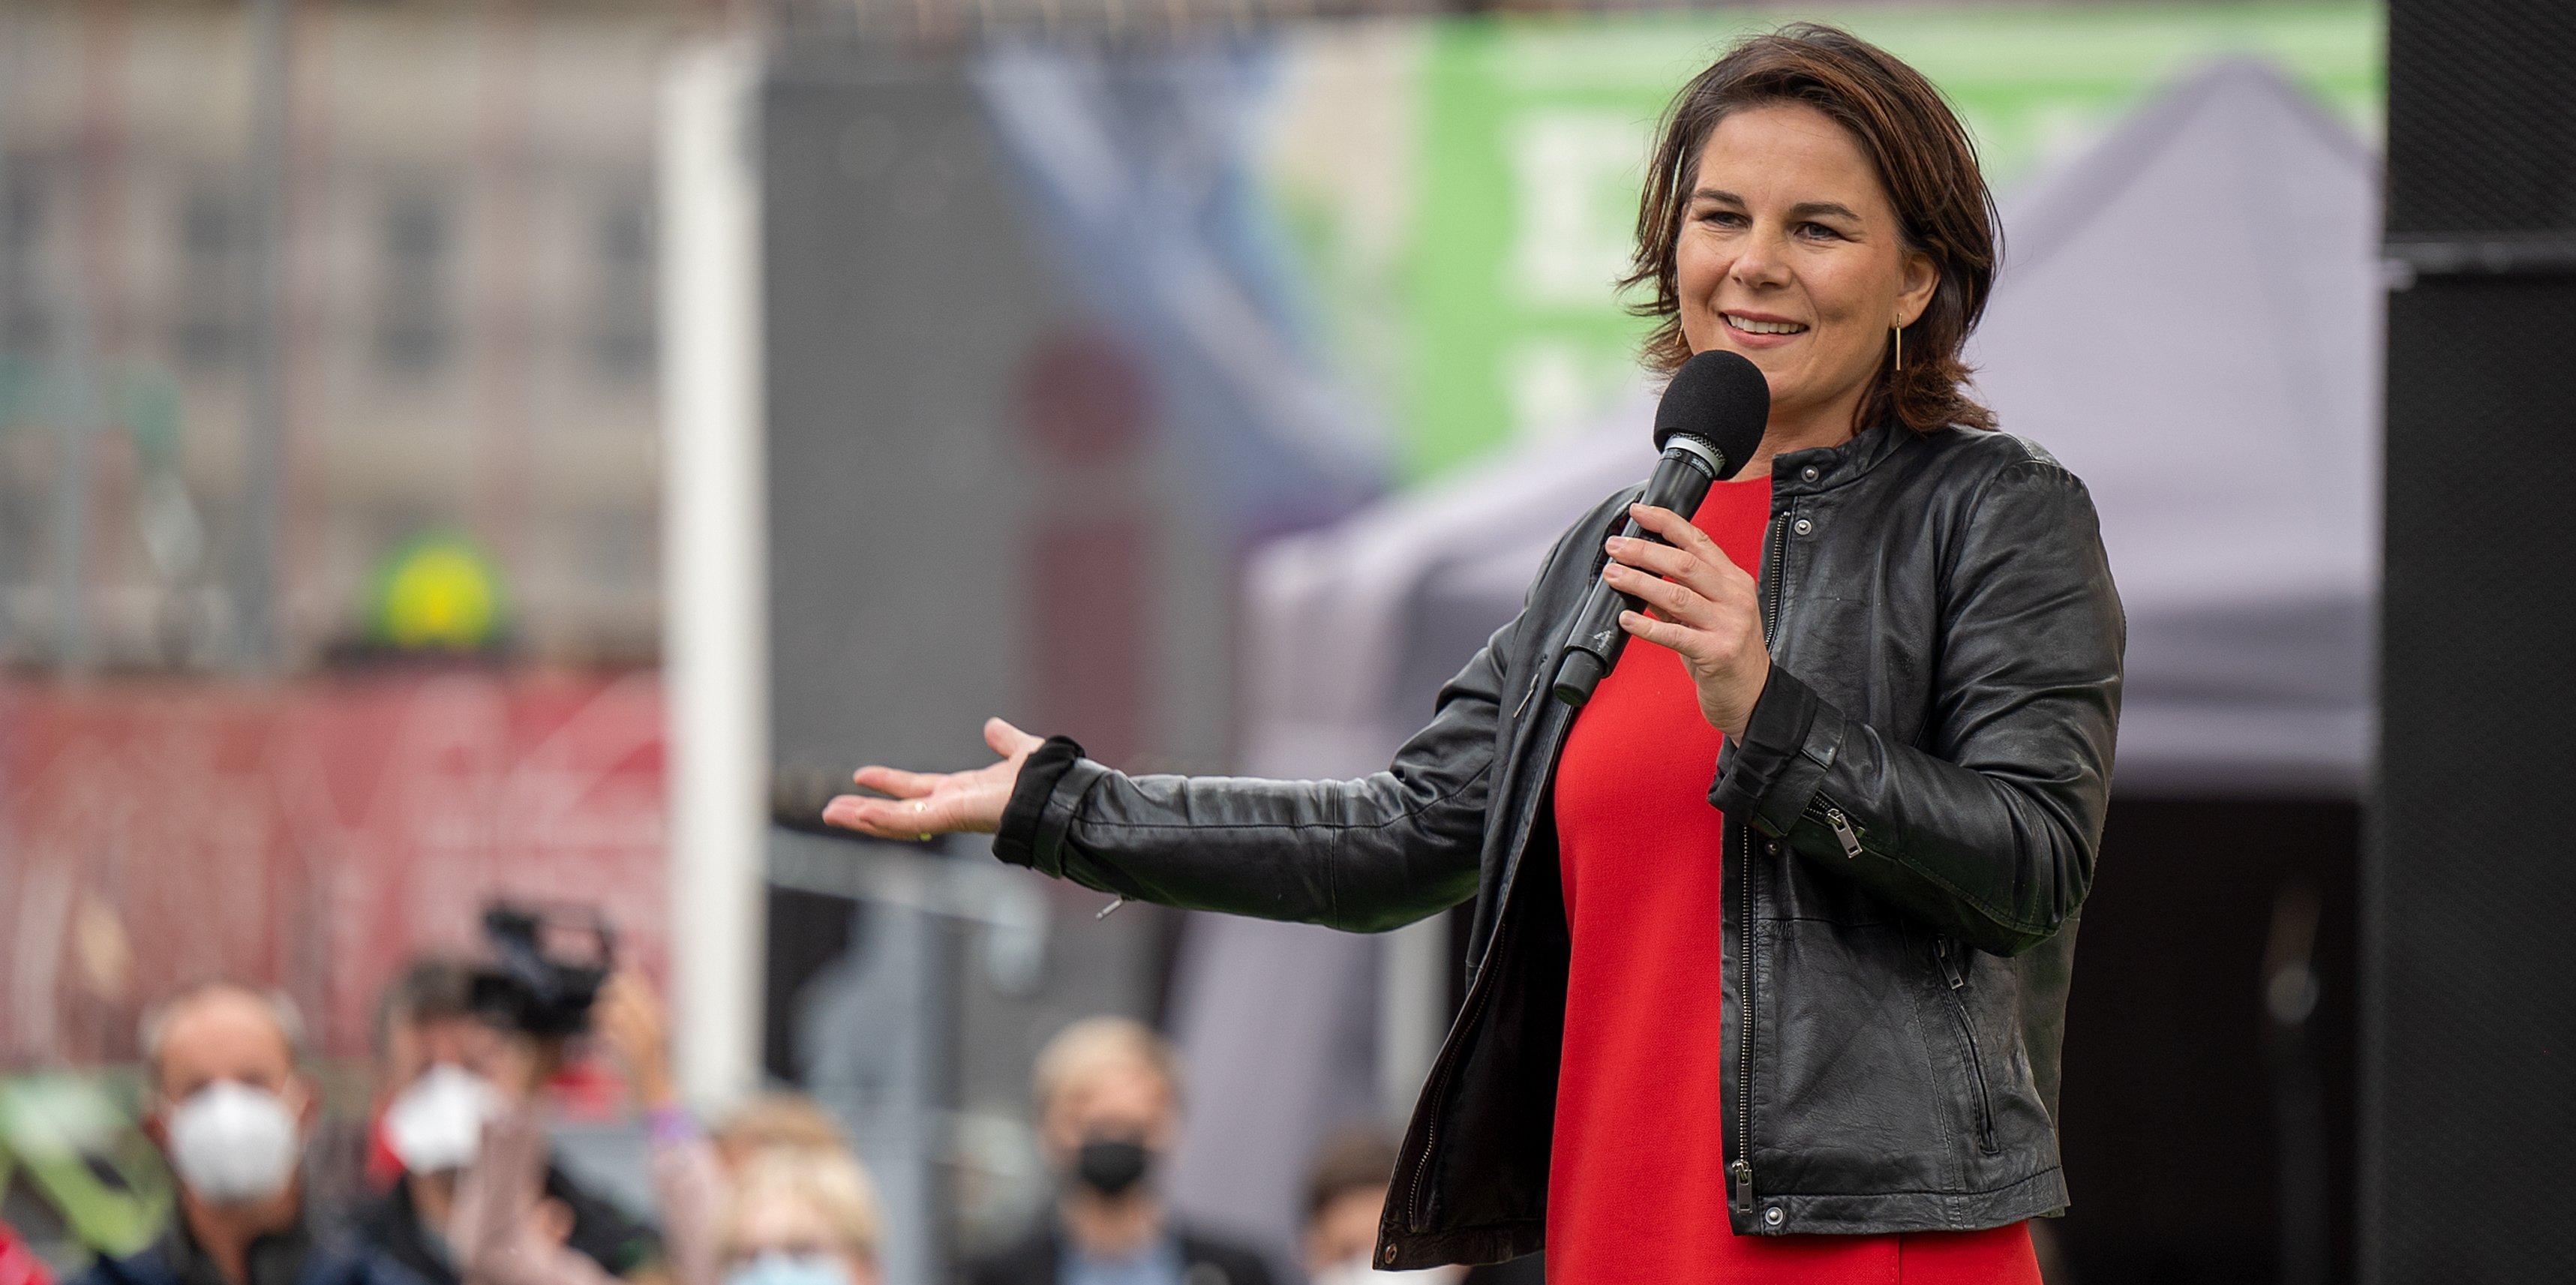 Greens close election campaign - Baerbock in Potsdam